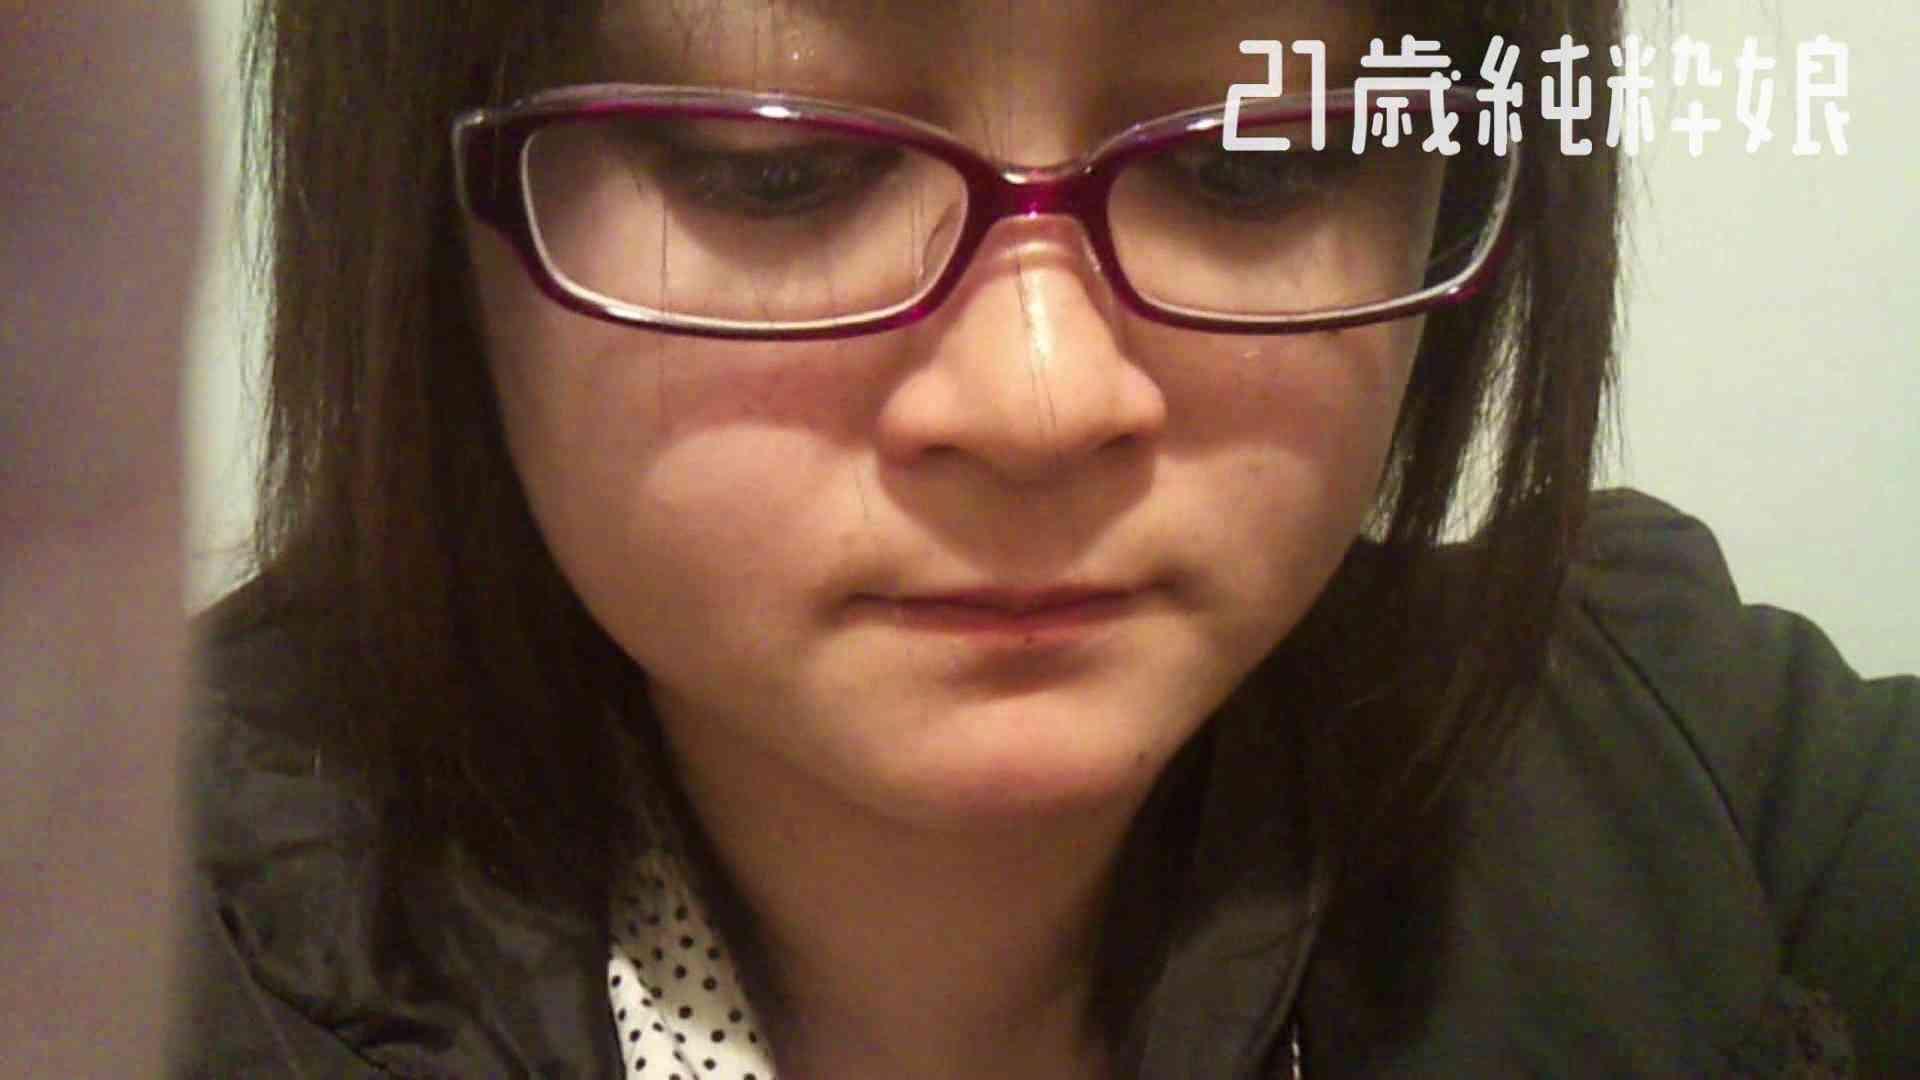 Gカップ21歳純粋嬢第2弾Vol.5 OLヌード天国 | 学校  110PIX 89